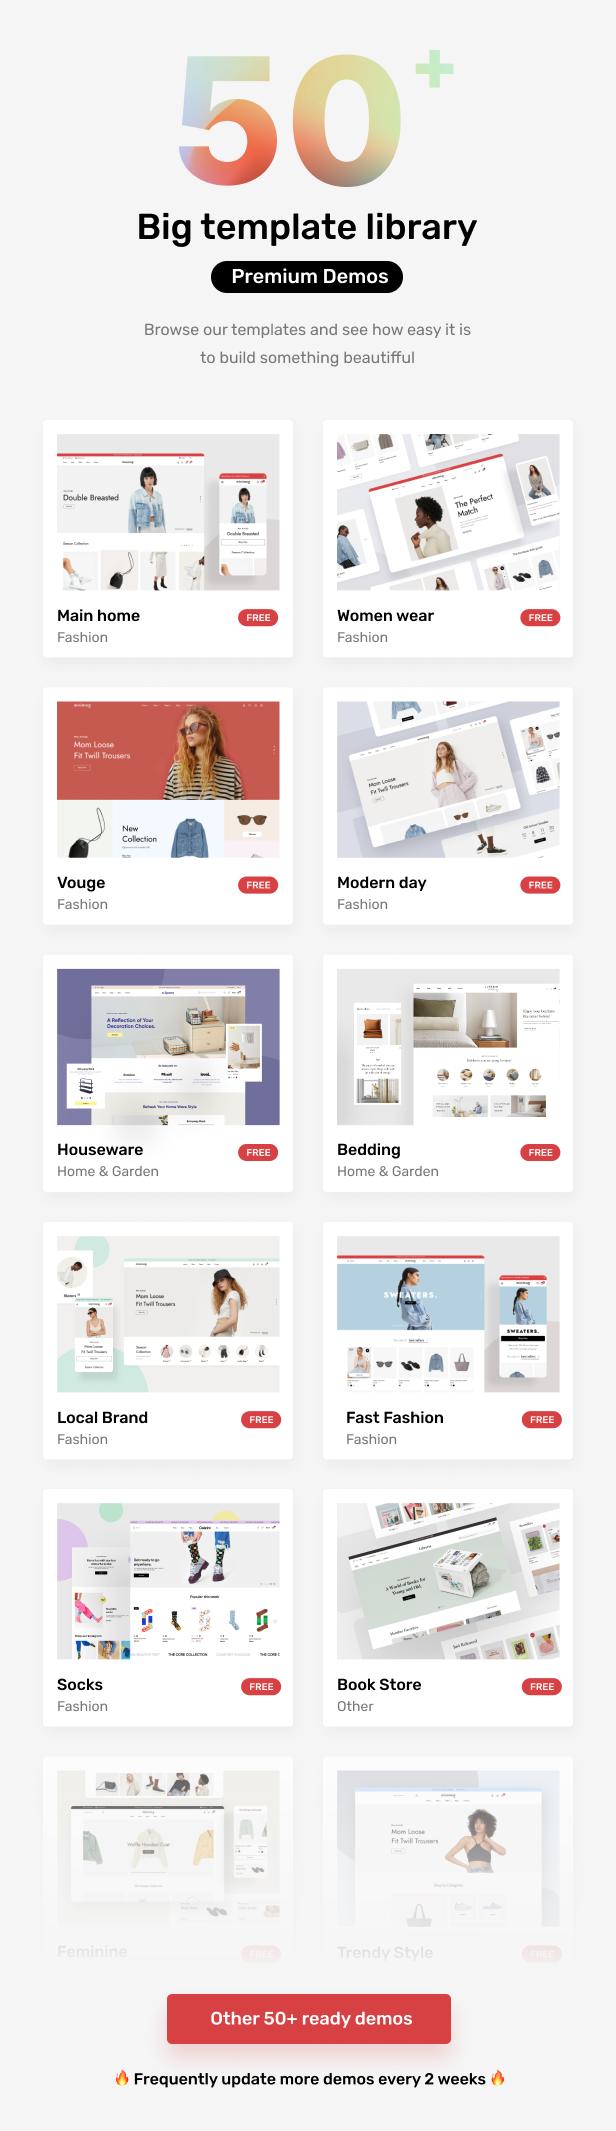 Minimog - The High Converting Shopify Theme - 17